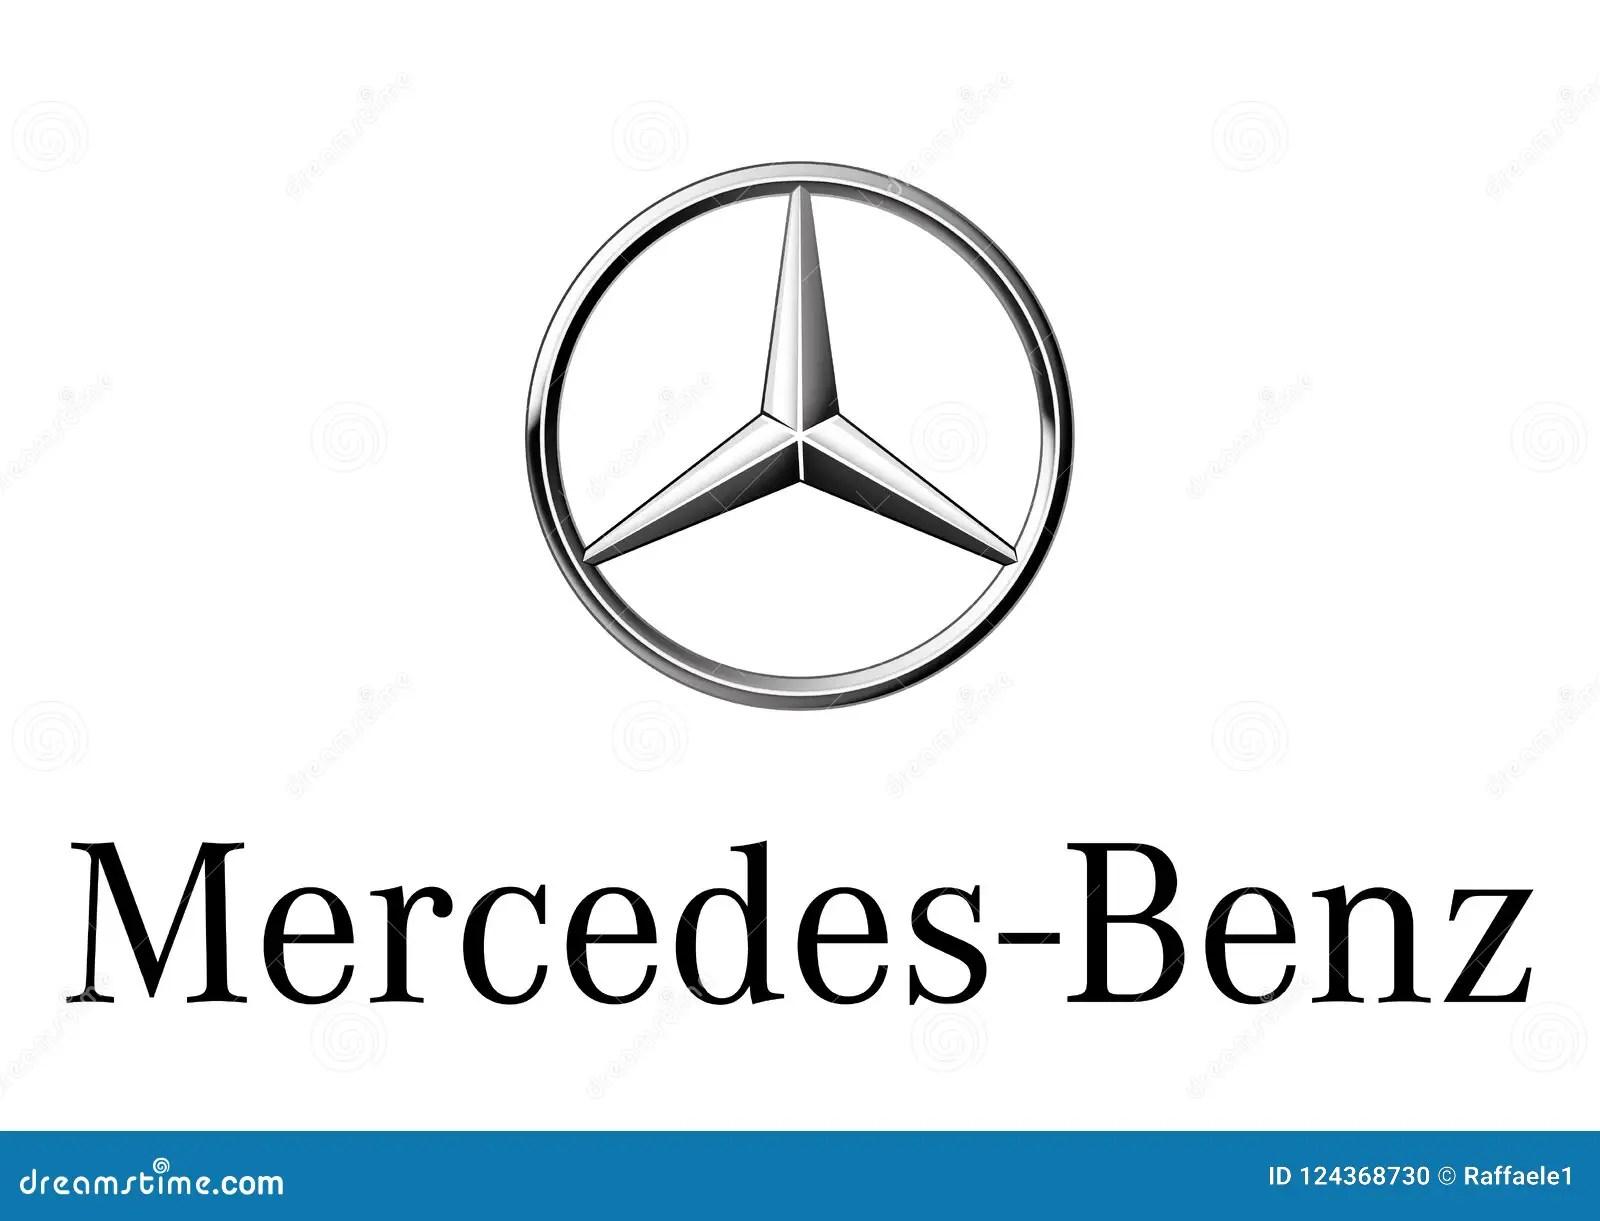 Mercedes Benz Stock Illustrations